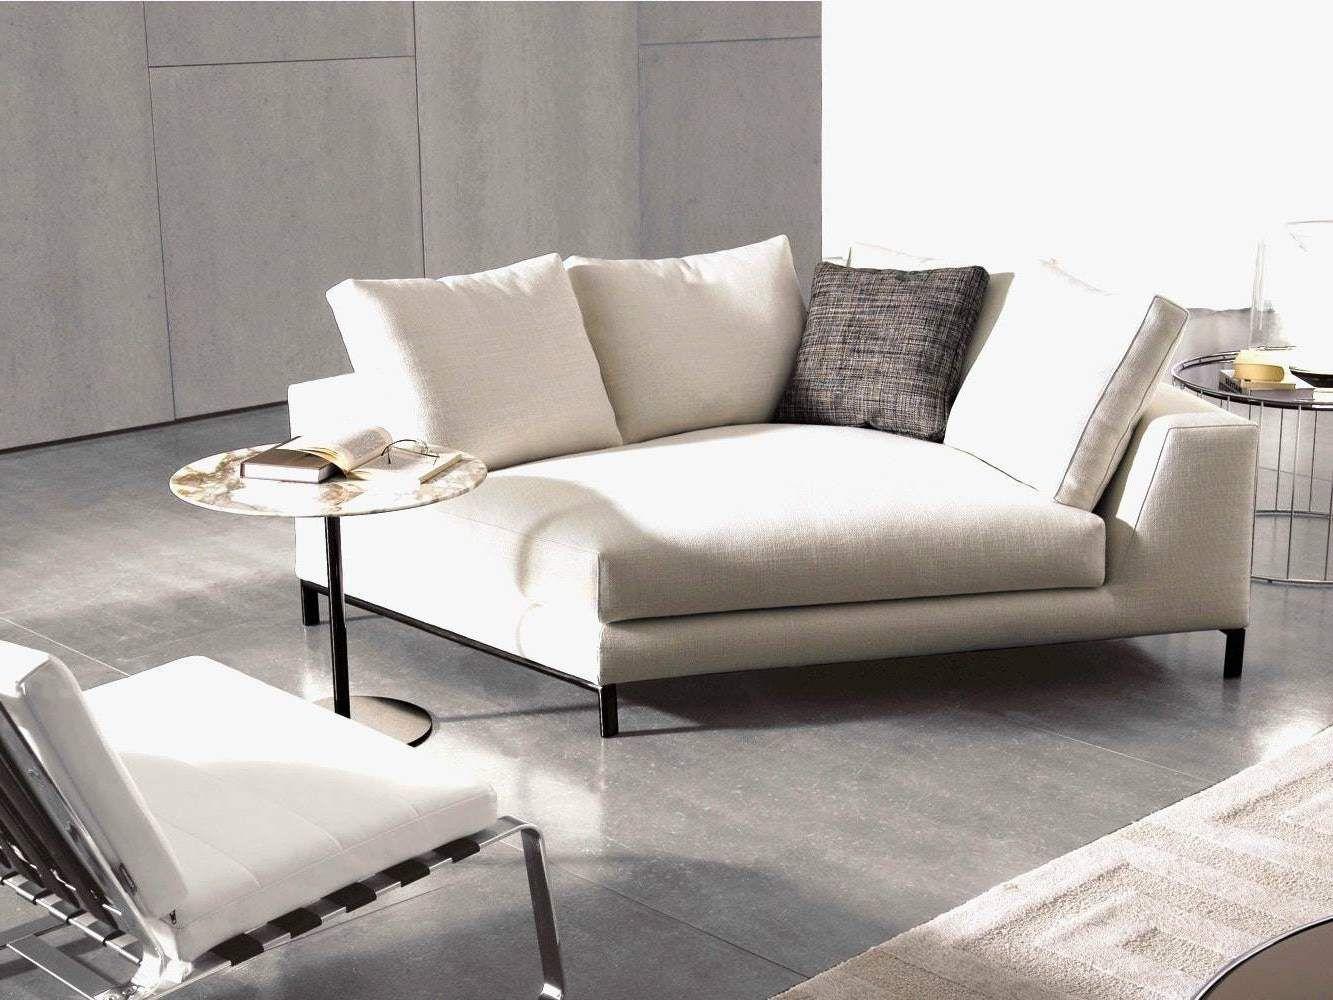 Schlafsofa Fur Kleine Raume Home Decor Home Furniture